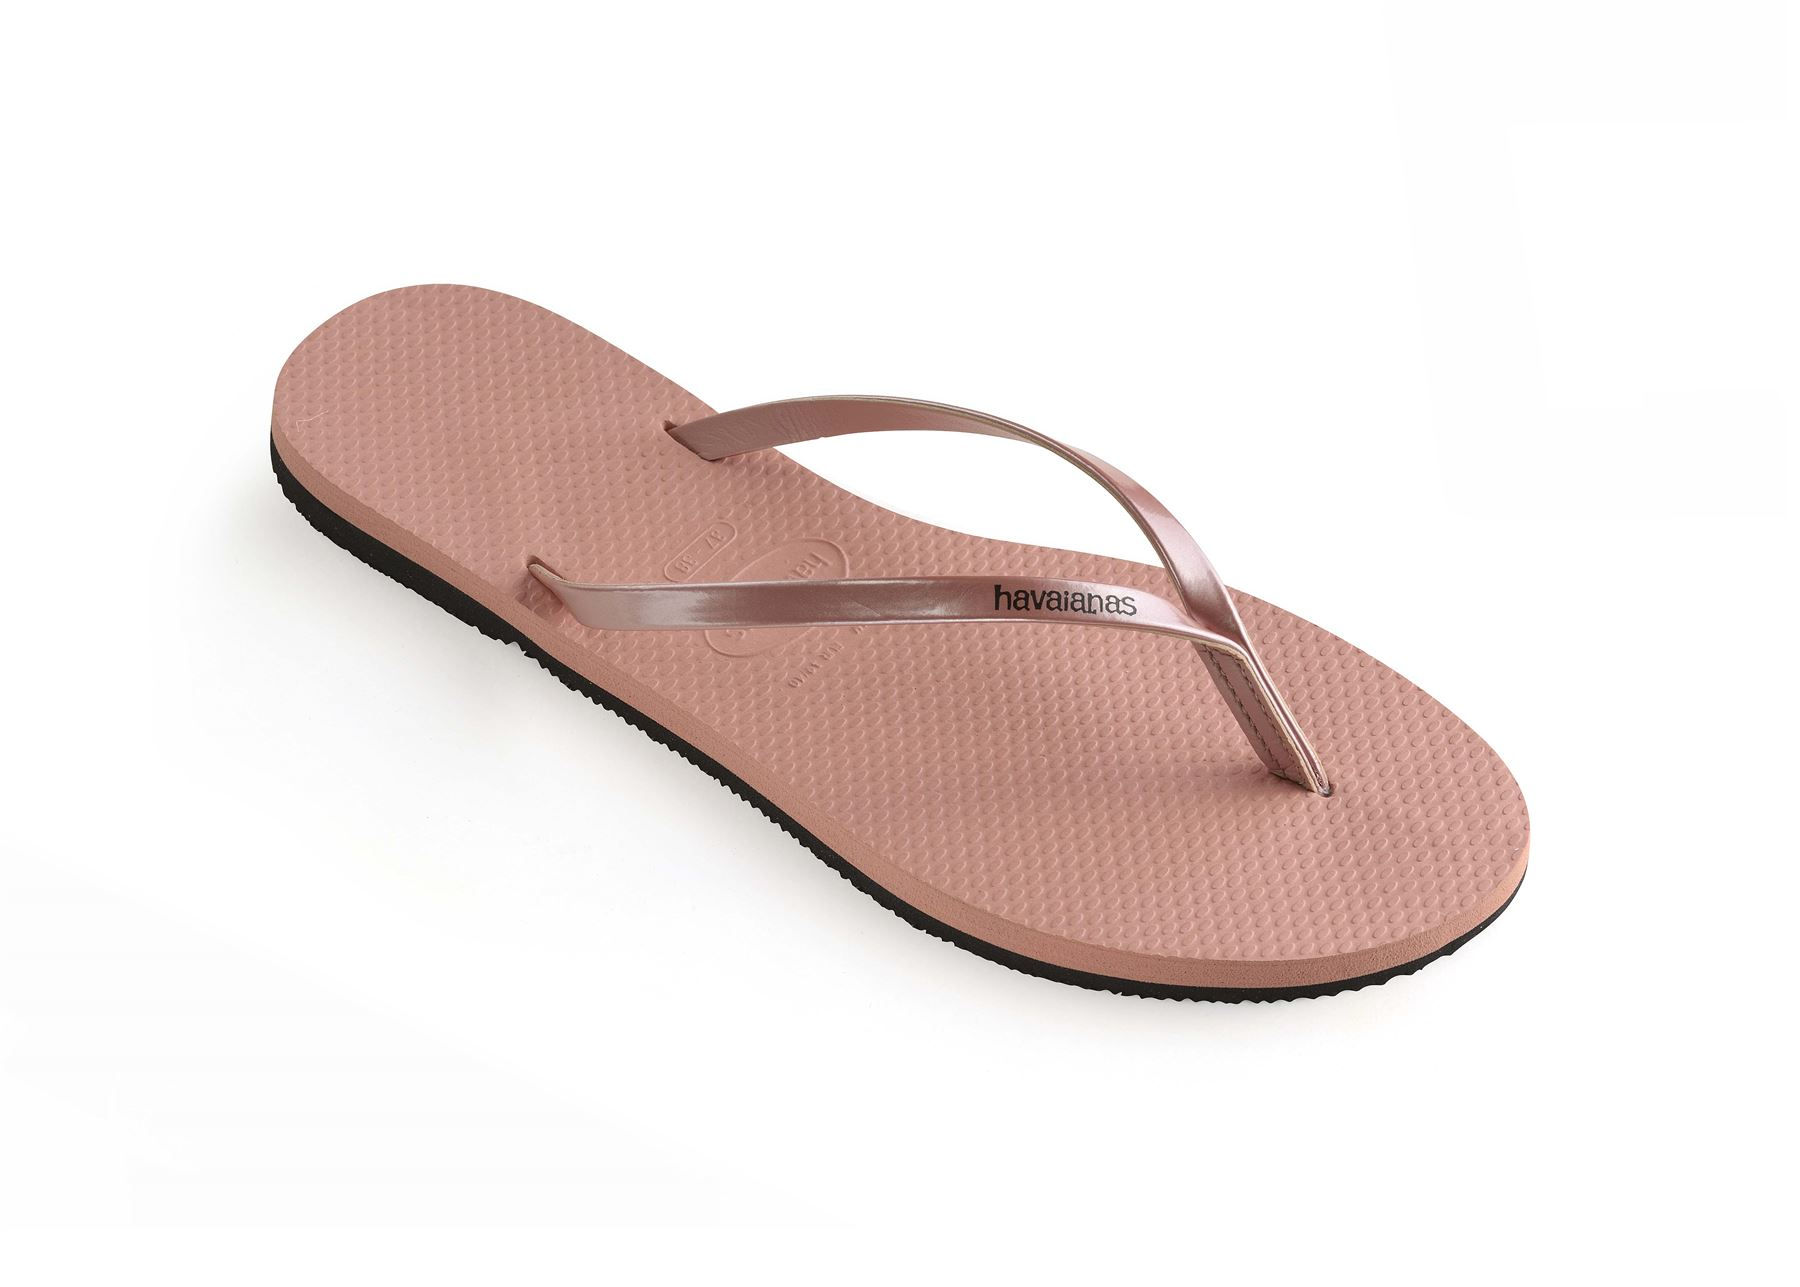 Havaianas-You-Metallic-Flip-Flops-Women-Summer-Beach-Sandals-Wide-Range-Colours miniature 8